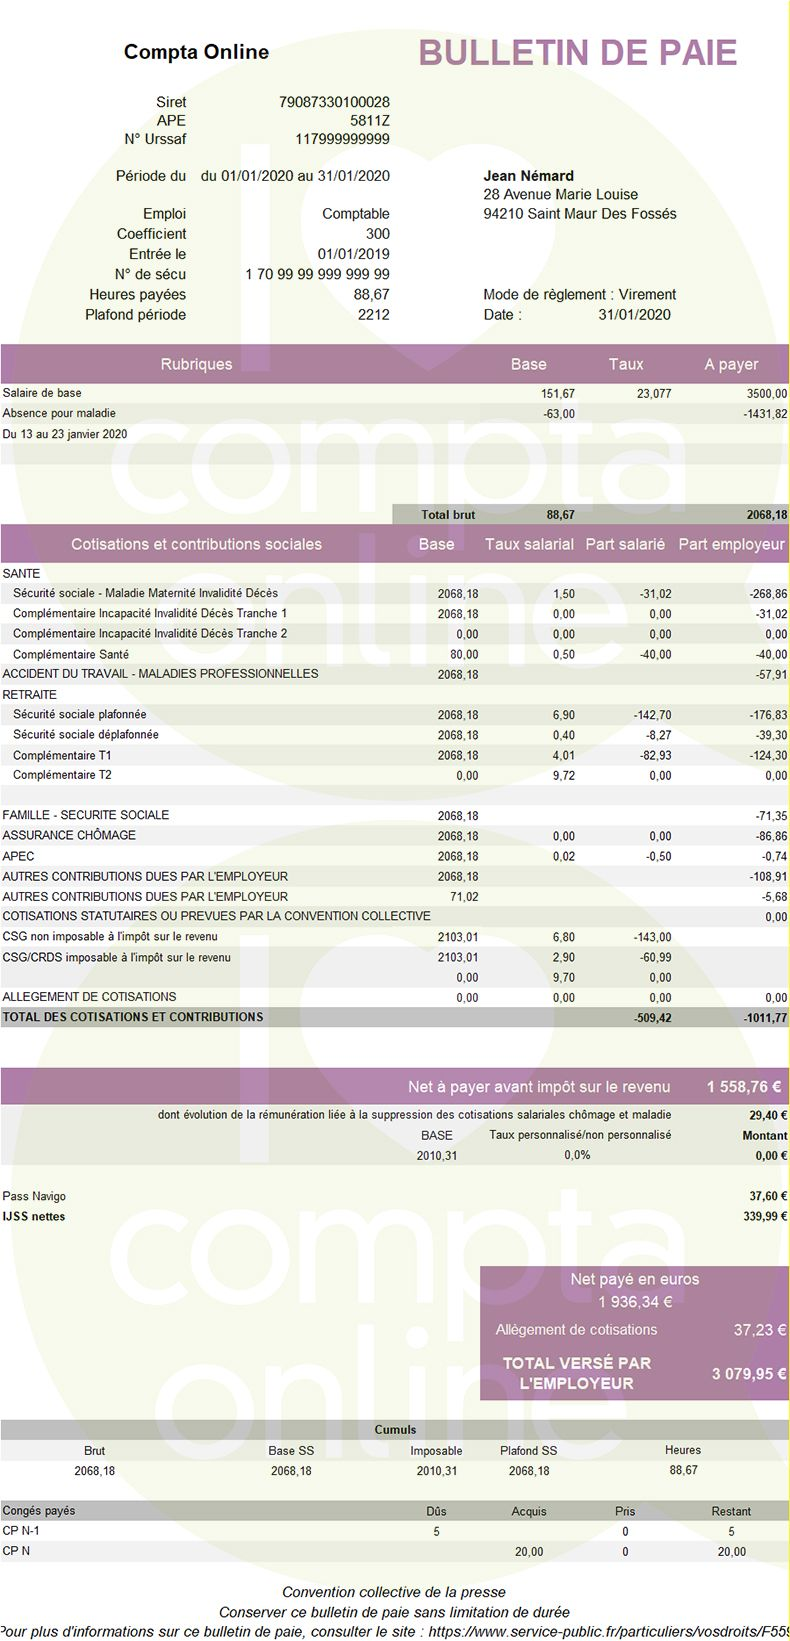 Fiche de salaire IJSS maladie